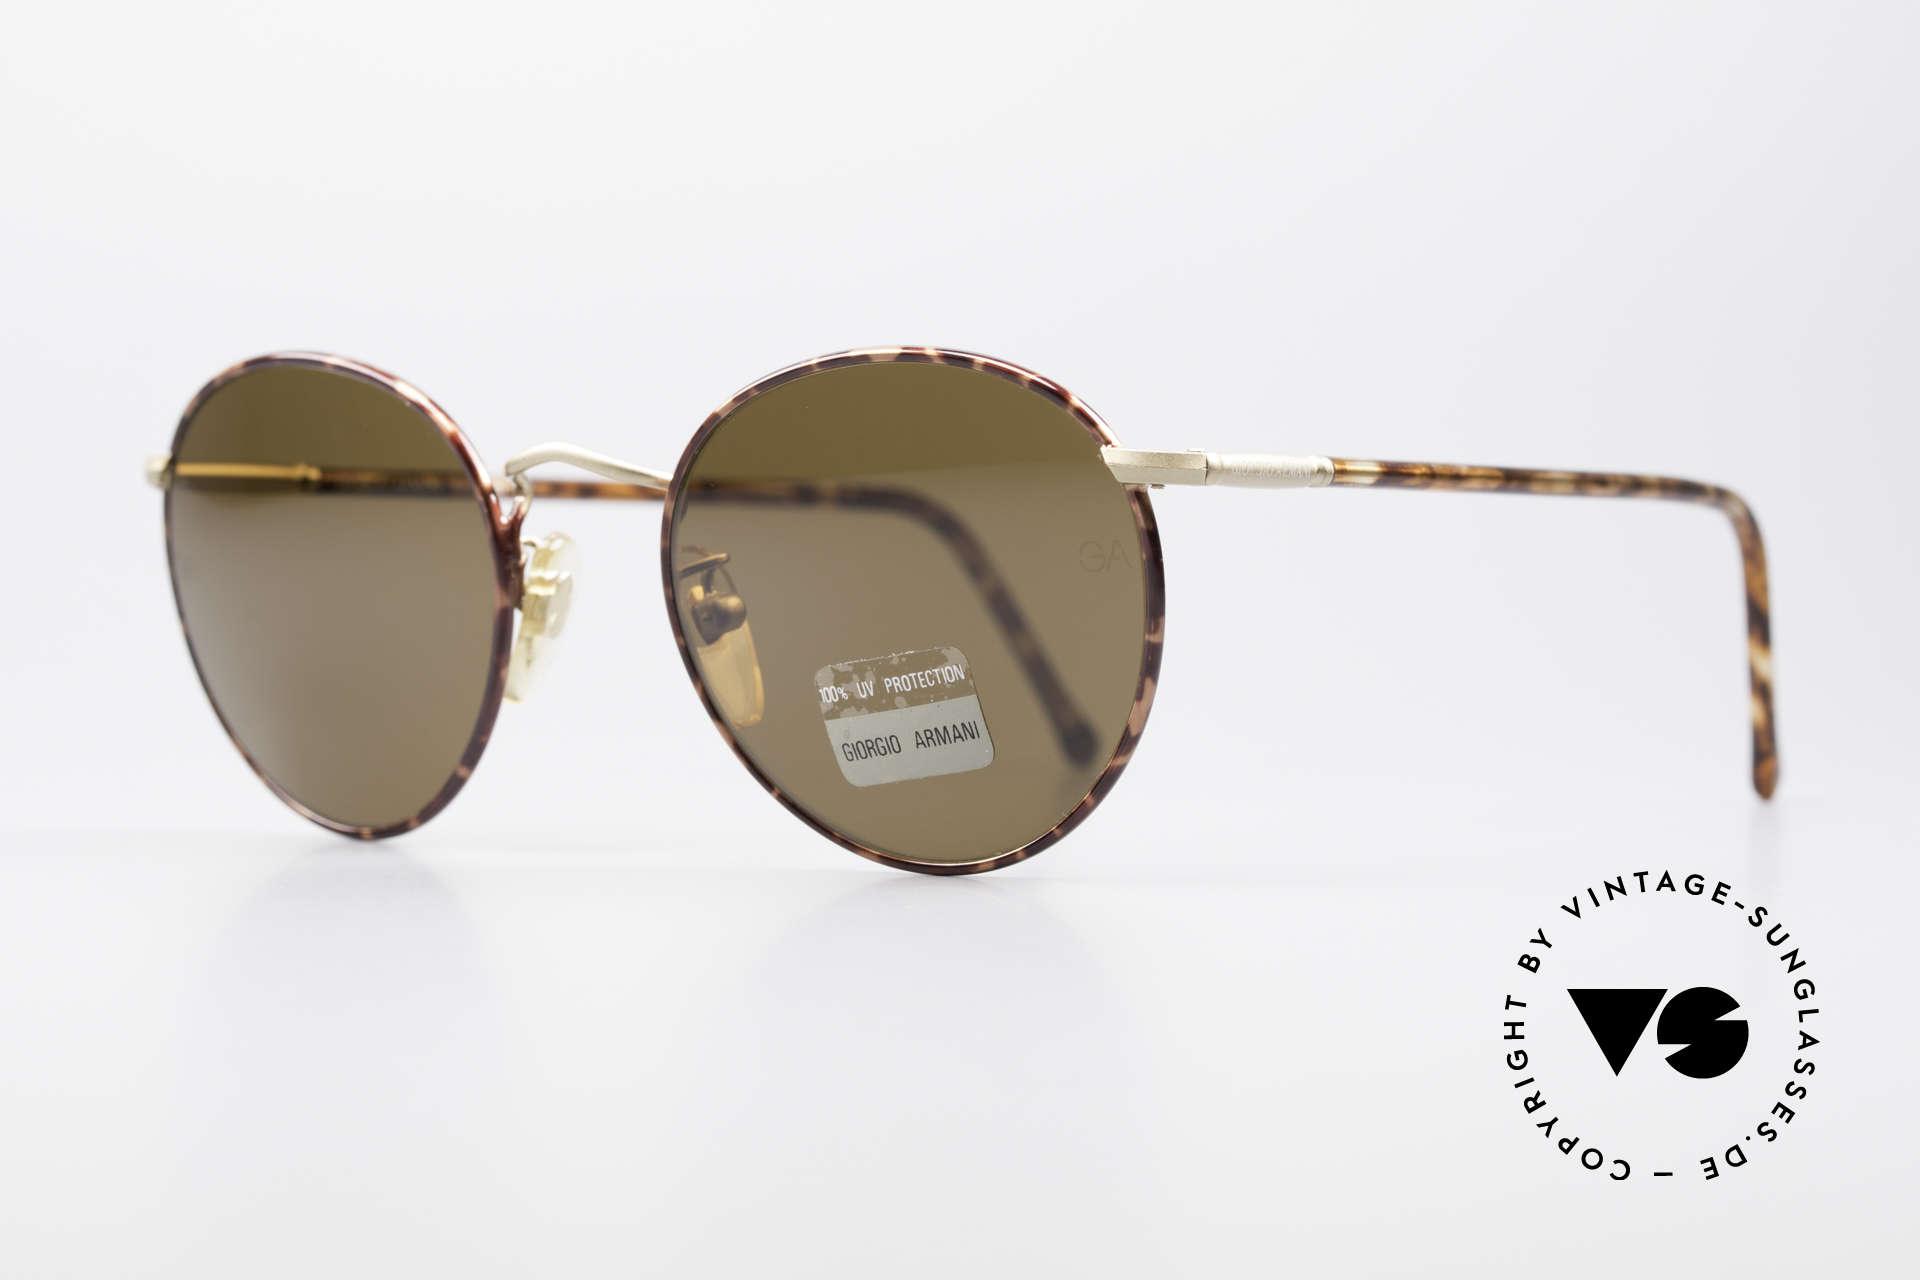 Giorgio Armani 639 No Retro Panto Sunglasses, TOP craftsmanship & timeless tortoise/gold coloring, Made for Men and Women